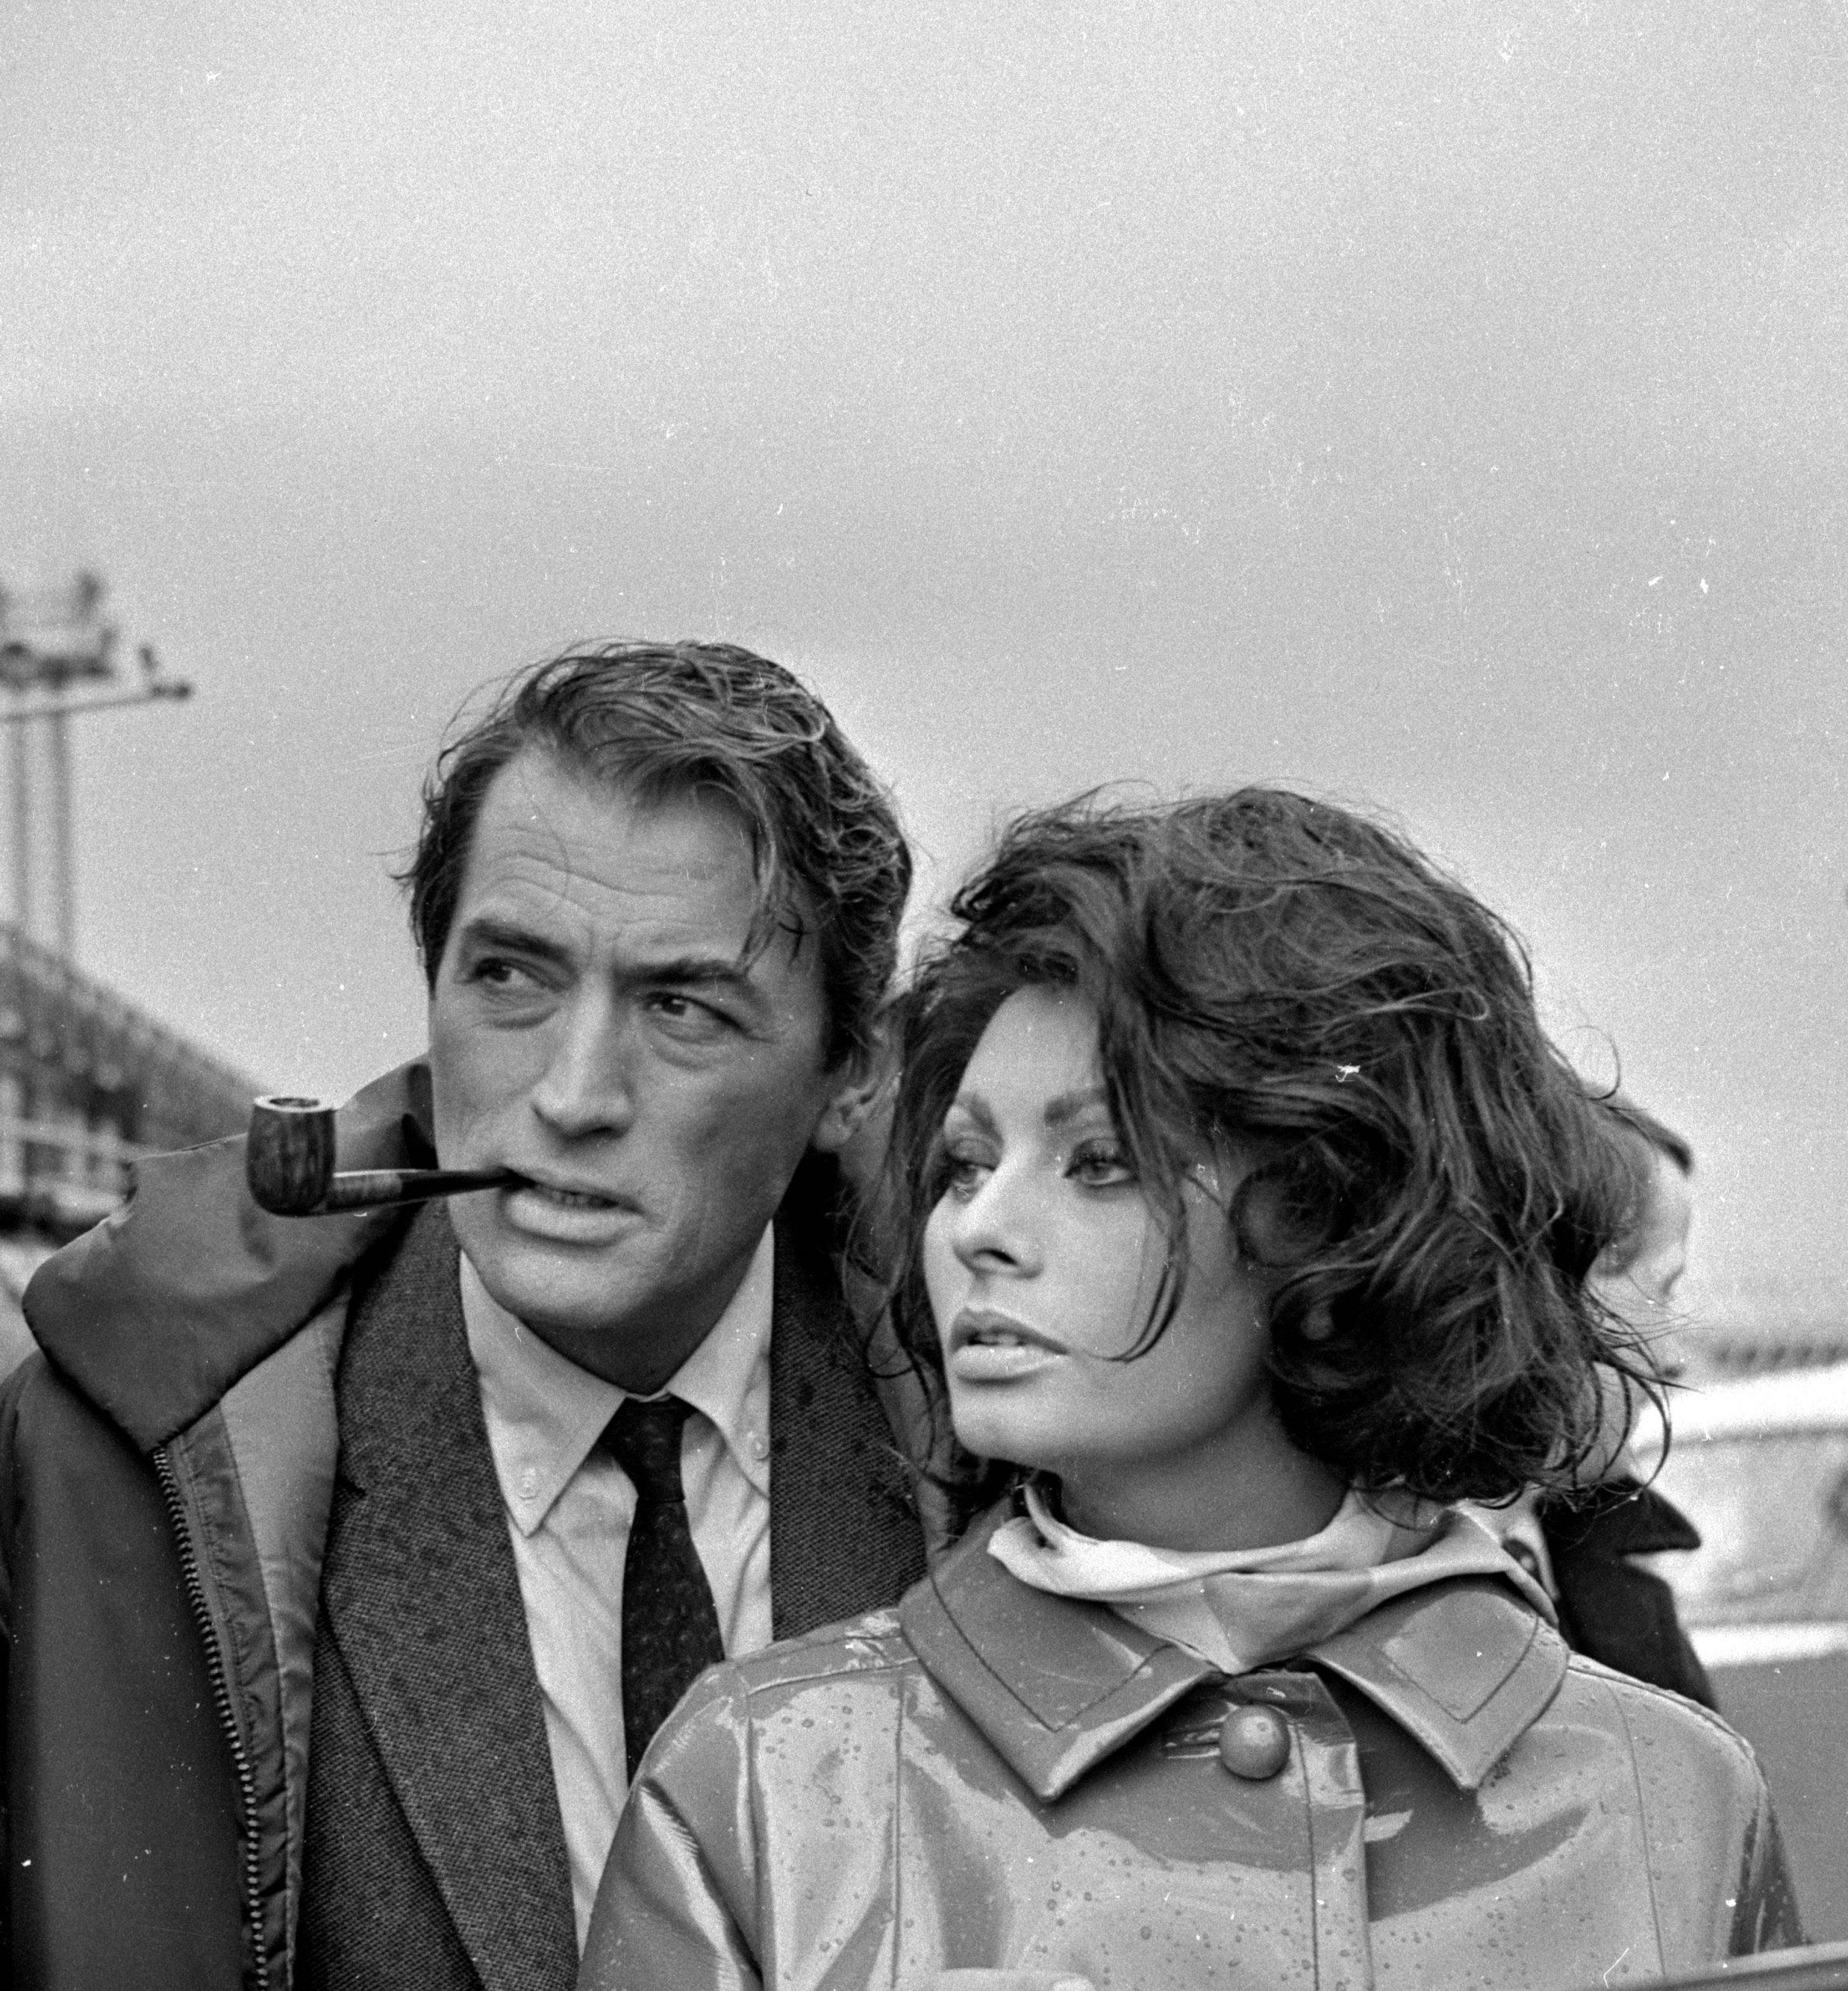 Gregory Peck y Sophia Loren en 1965 / Foto: Getty Images